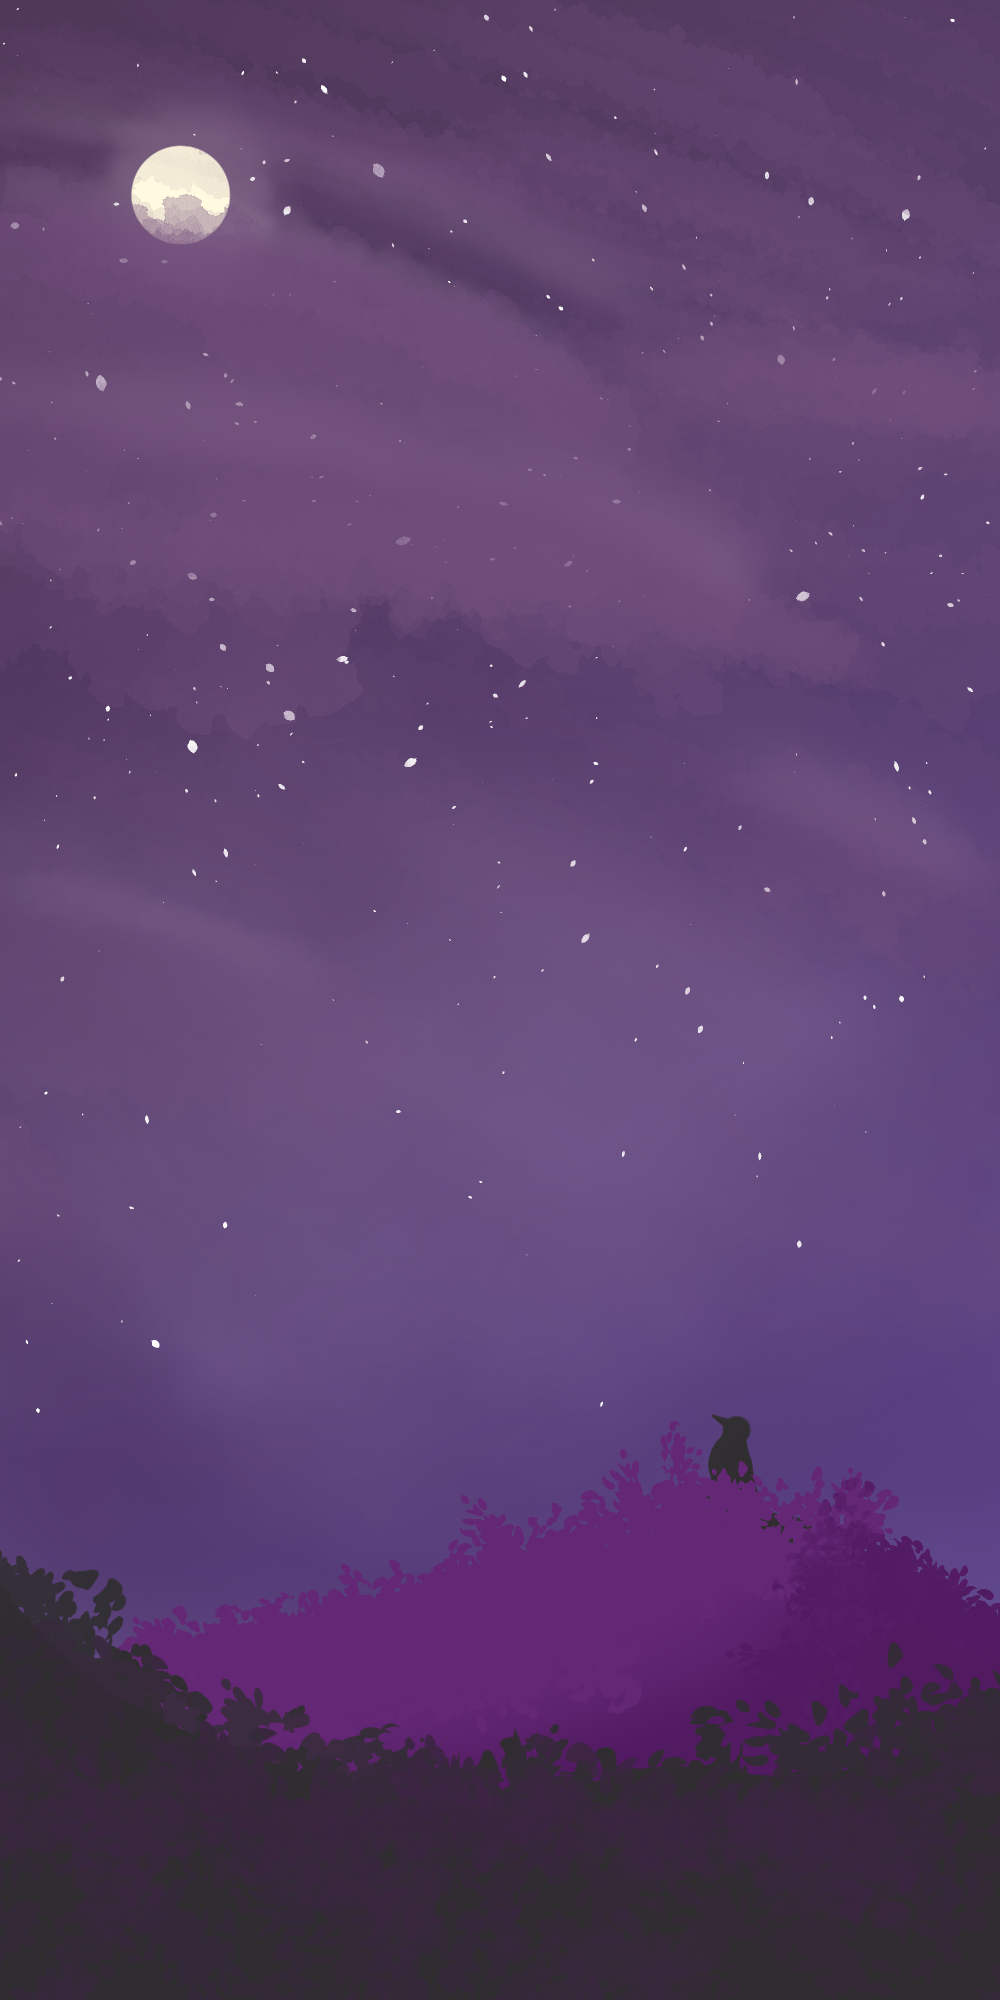 purplenightsky.png